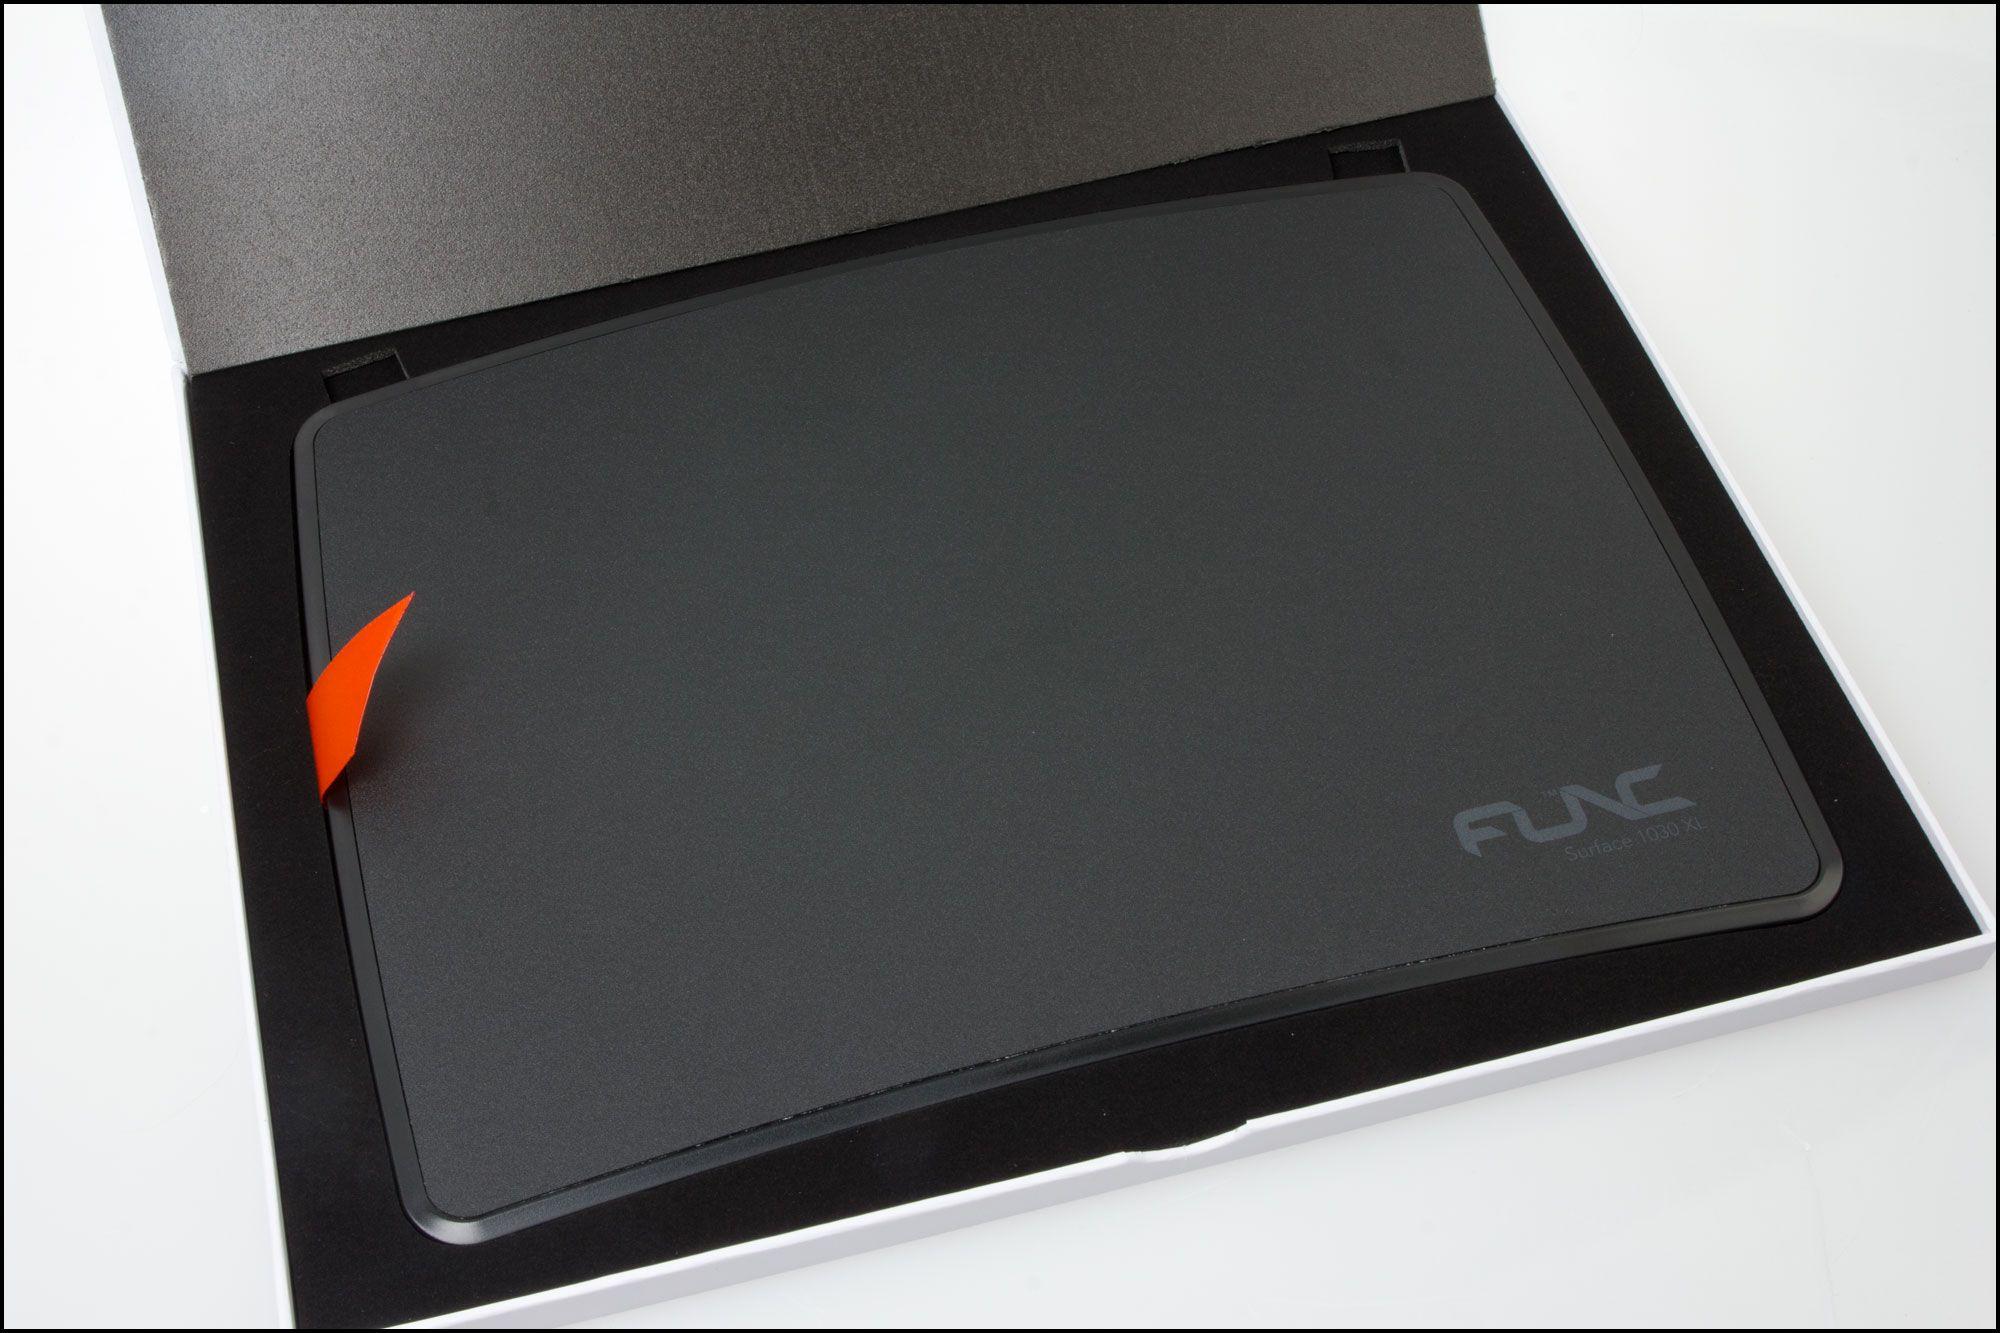 Func Surface 1030 XL.Foto: Rolf B. Wegner, Hardware.no